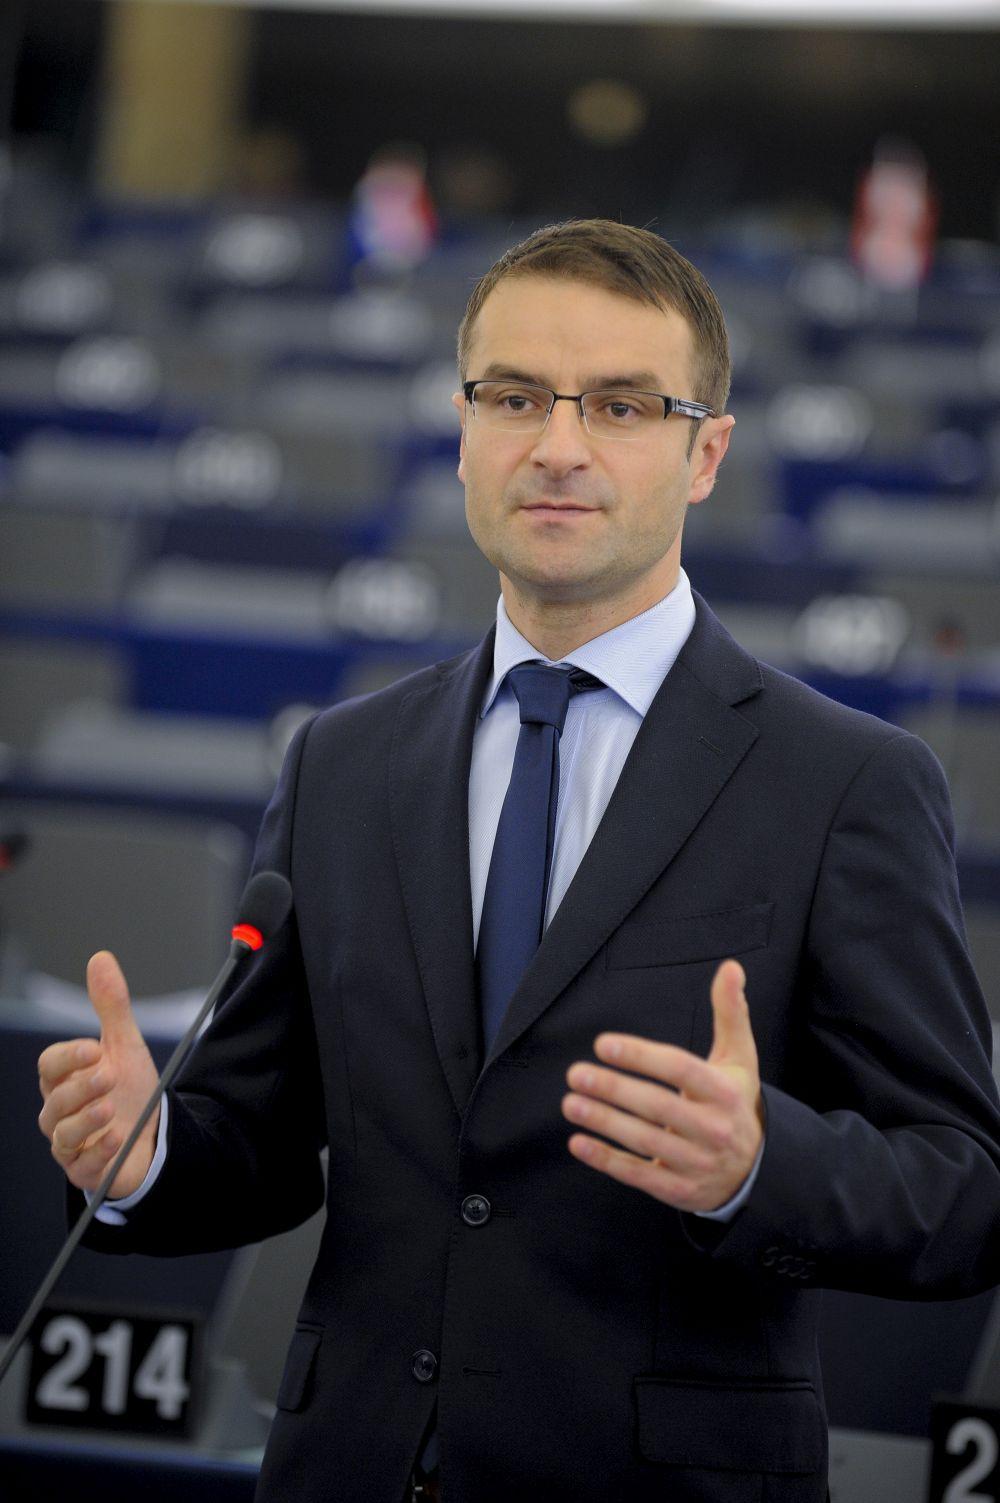 Tomasz Piotr POREBA